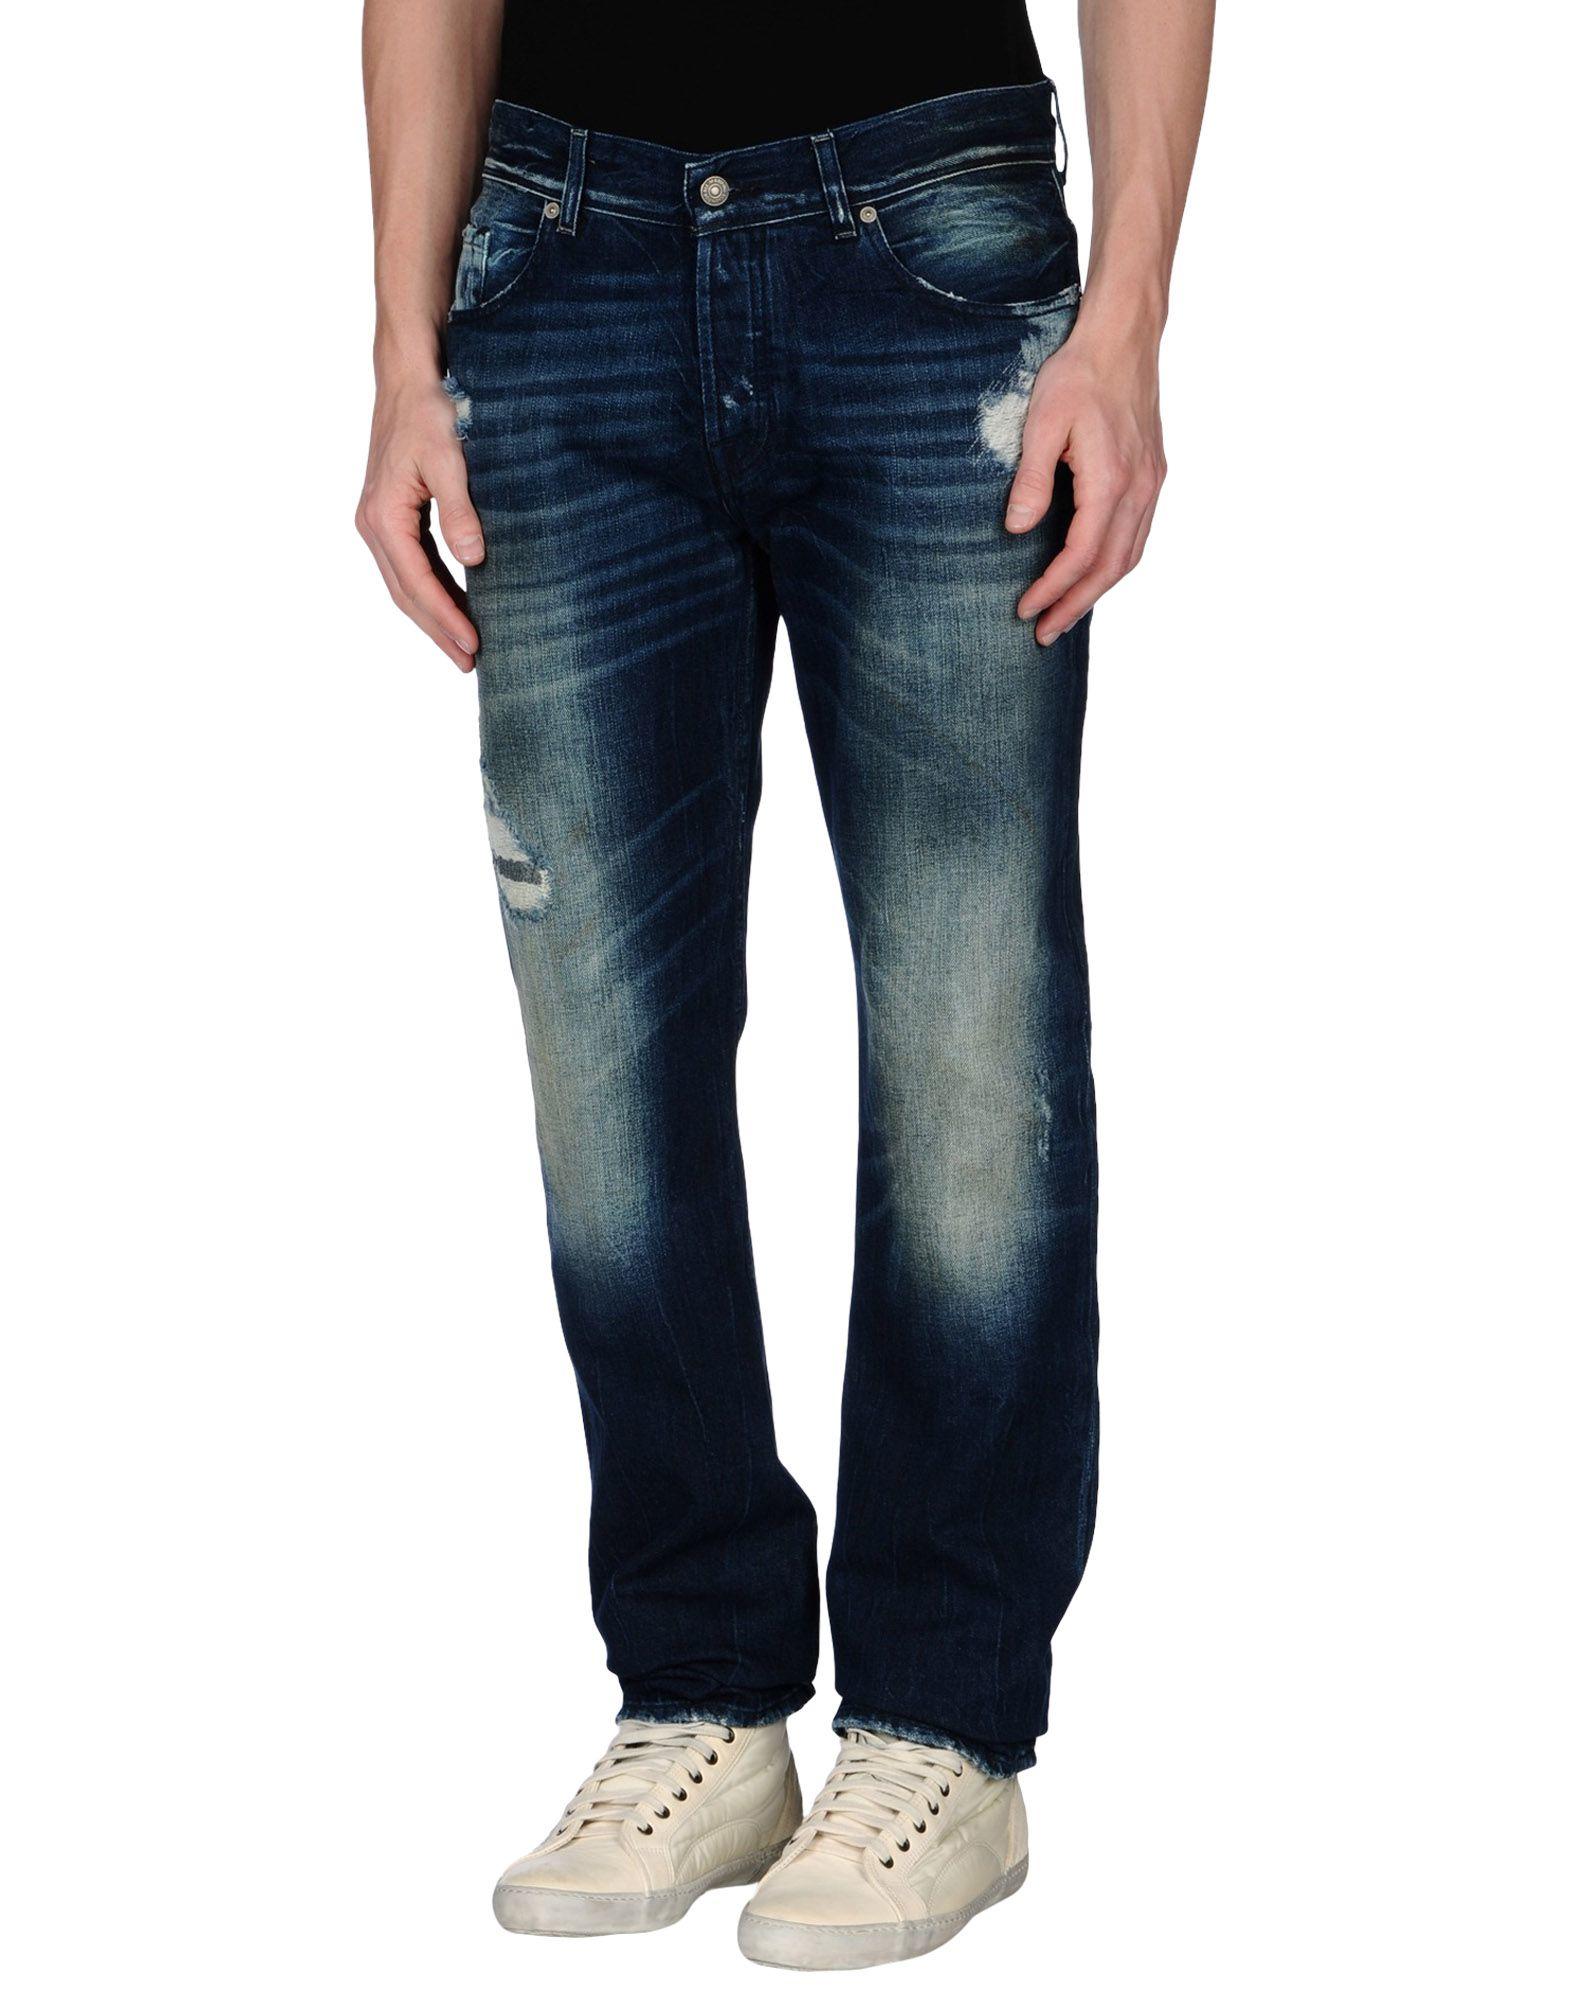 7 for all mankind denim trousers in blue for men lyst. Black Bedroom Furniture Sets. Home Design Ideas